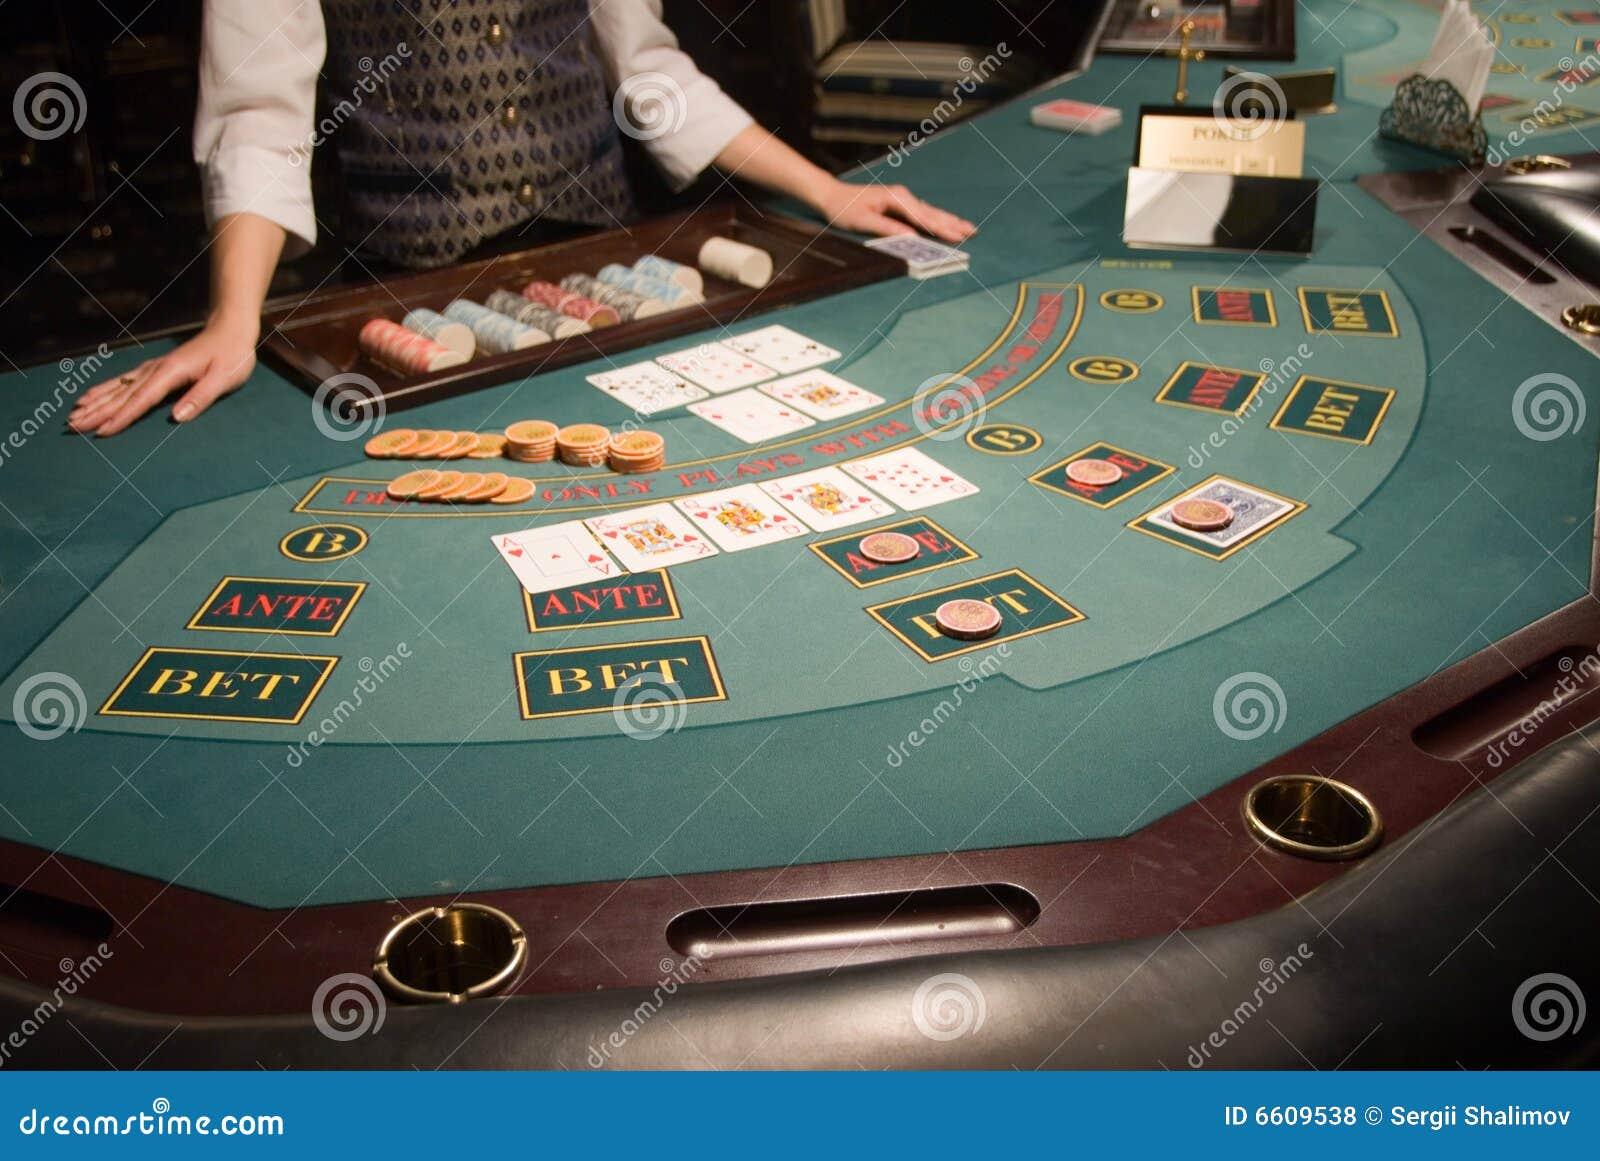 Poker ups